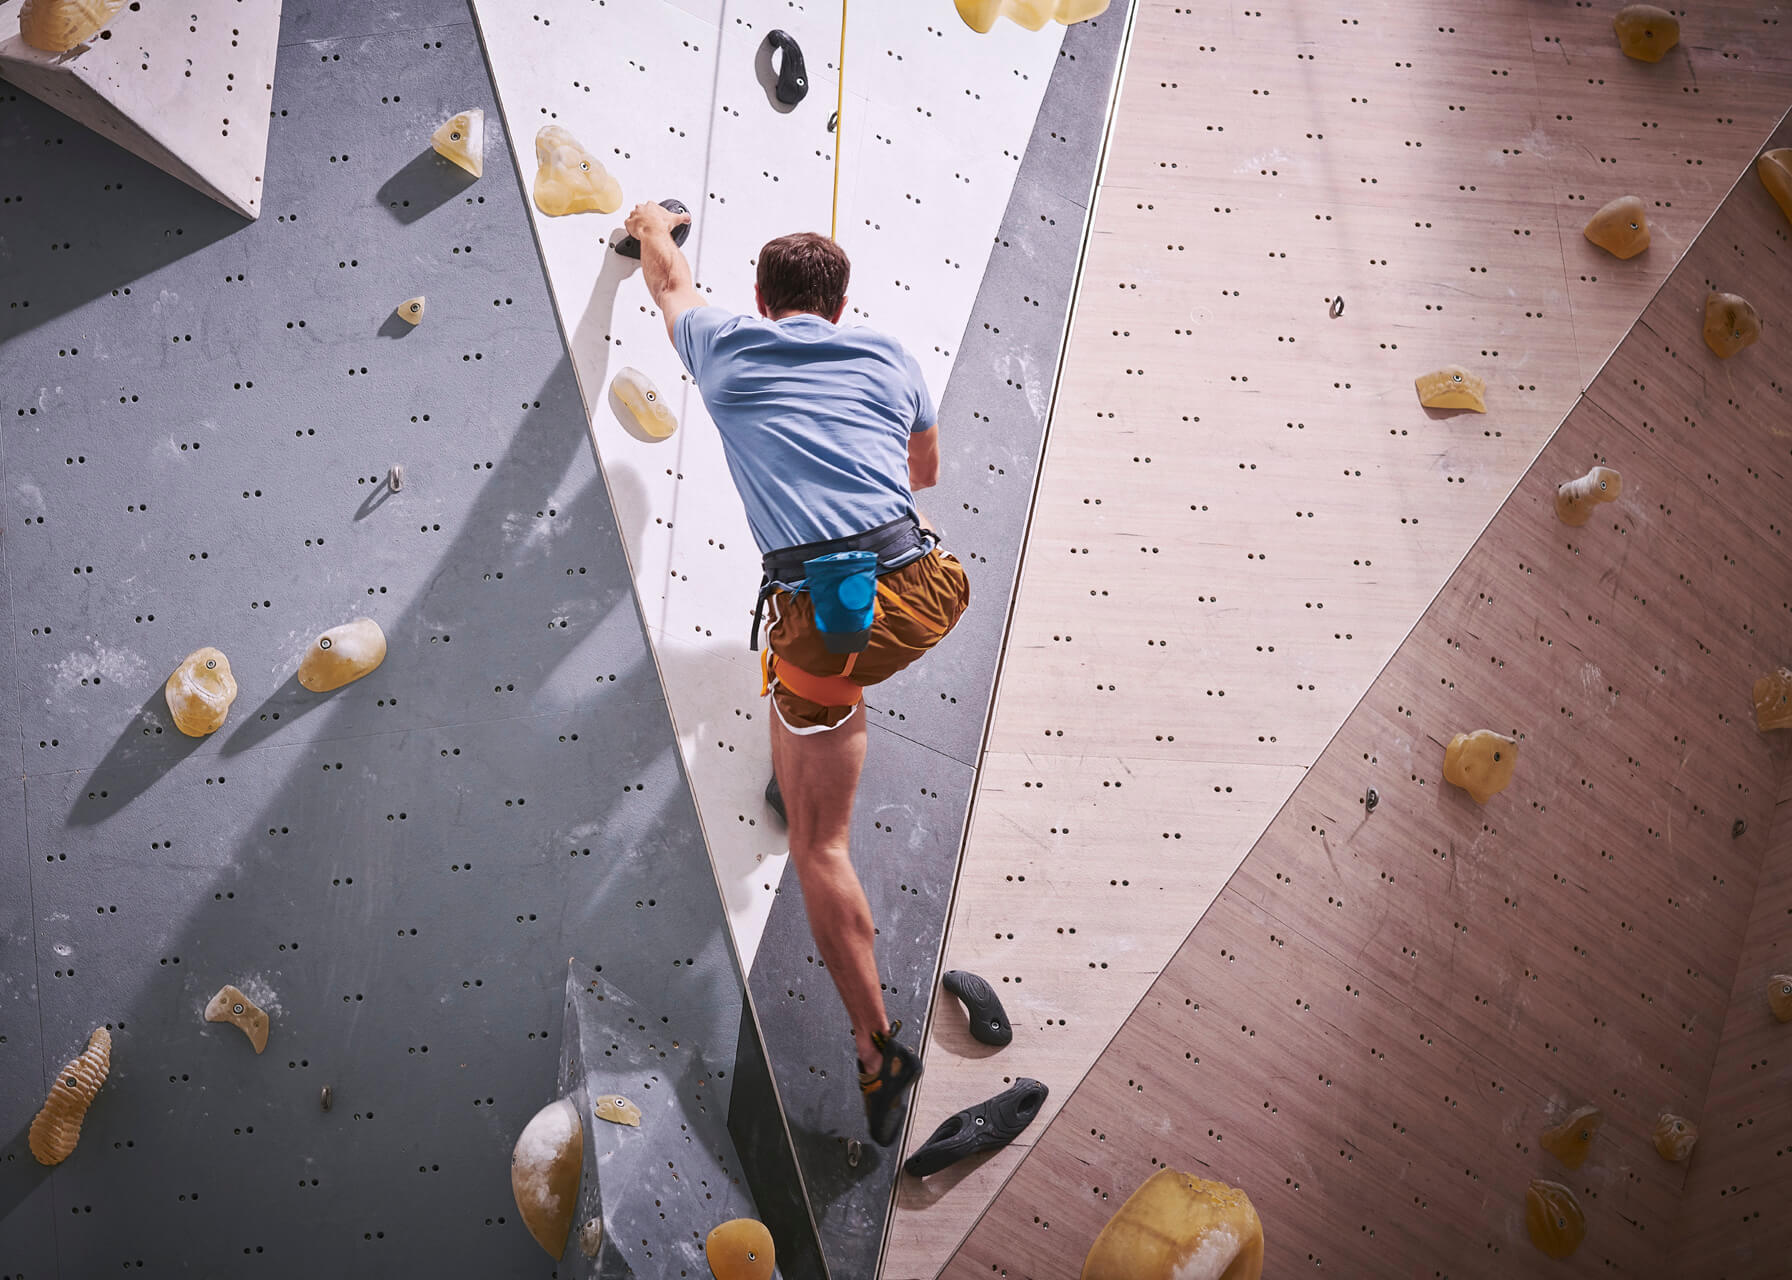 20_20191006_loctite_08_climbing_3855